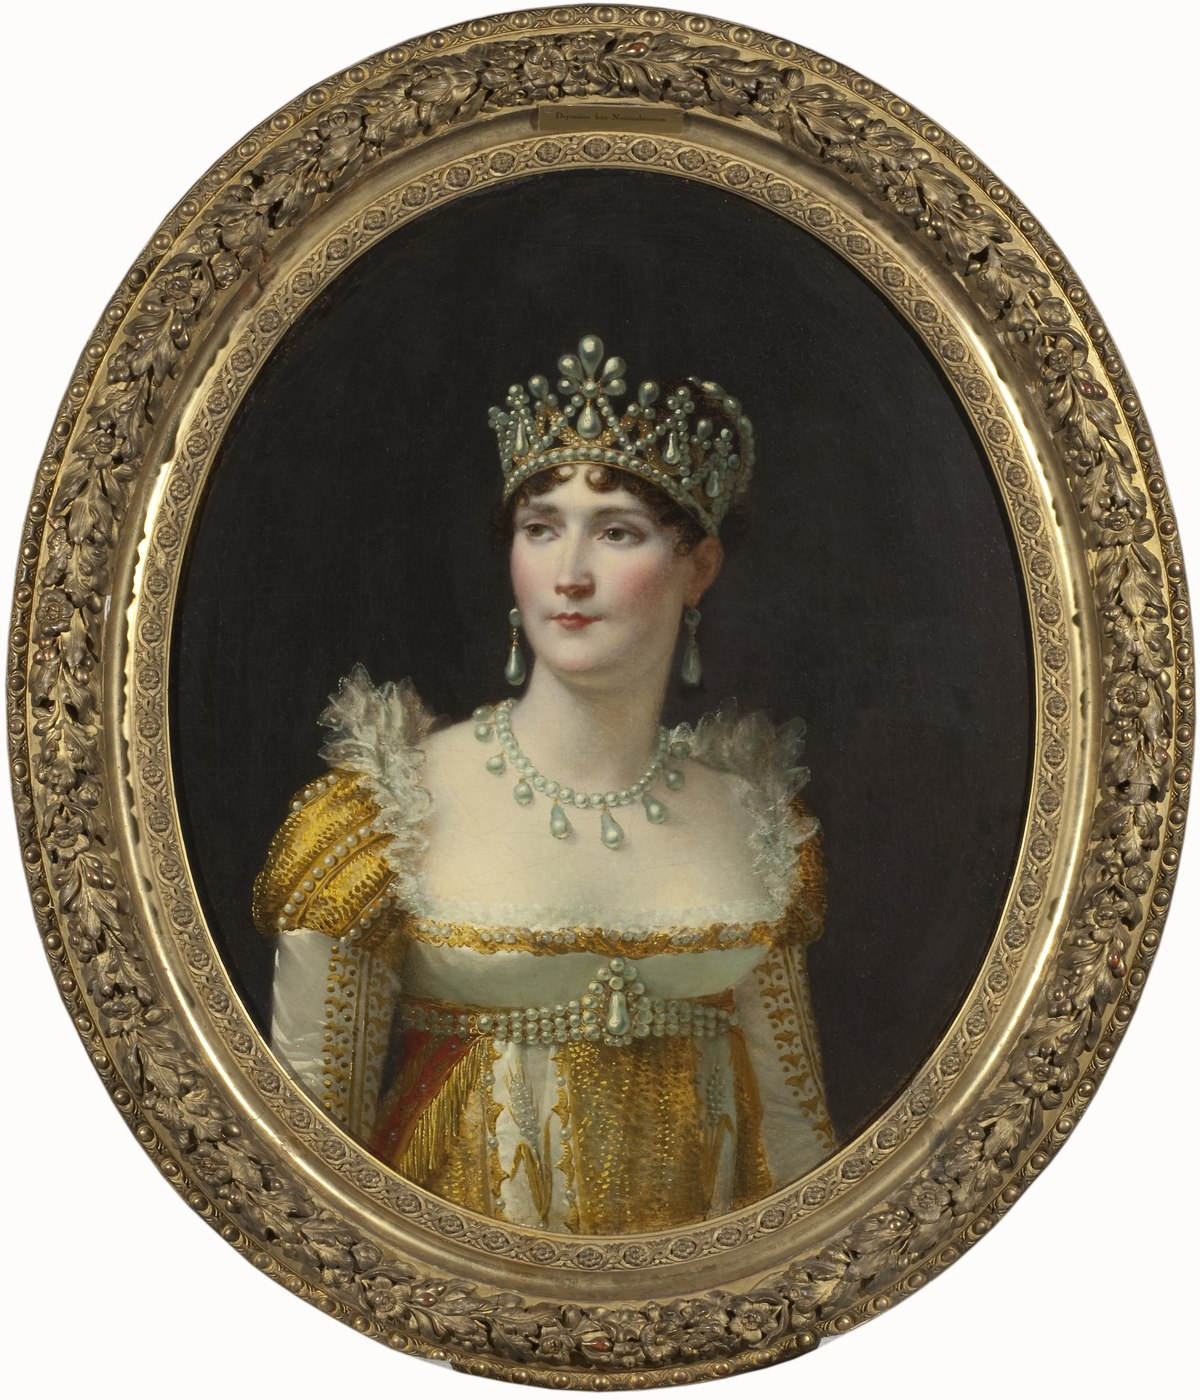 Joséphine Empress Wikipedia Empress Joséphine Joséphine Wikipedia Empress Wikipedia Joséphine Empress Empress Joséphine Wikipedia Wikipedia Pk08nwXON